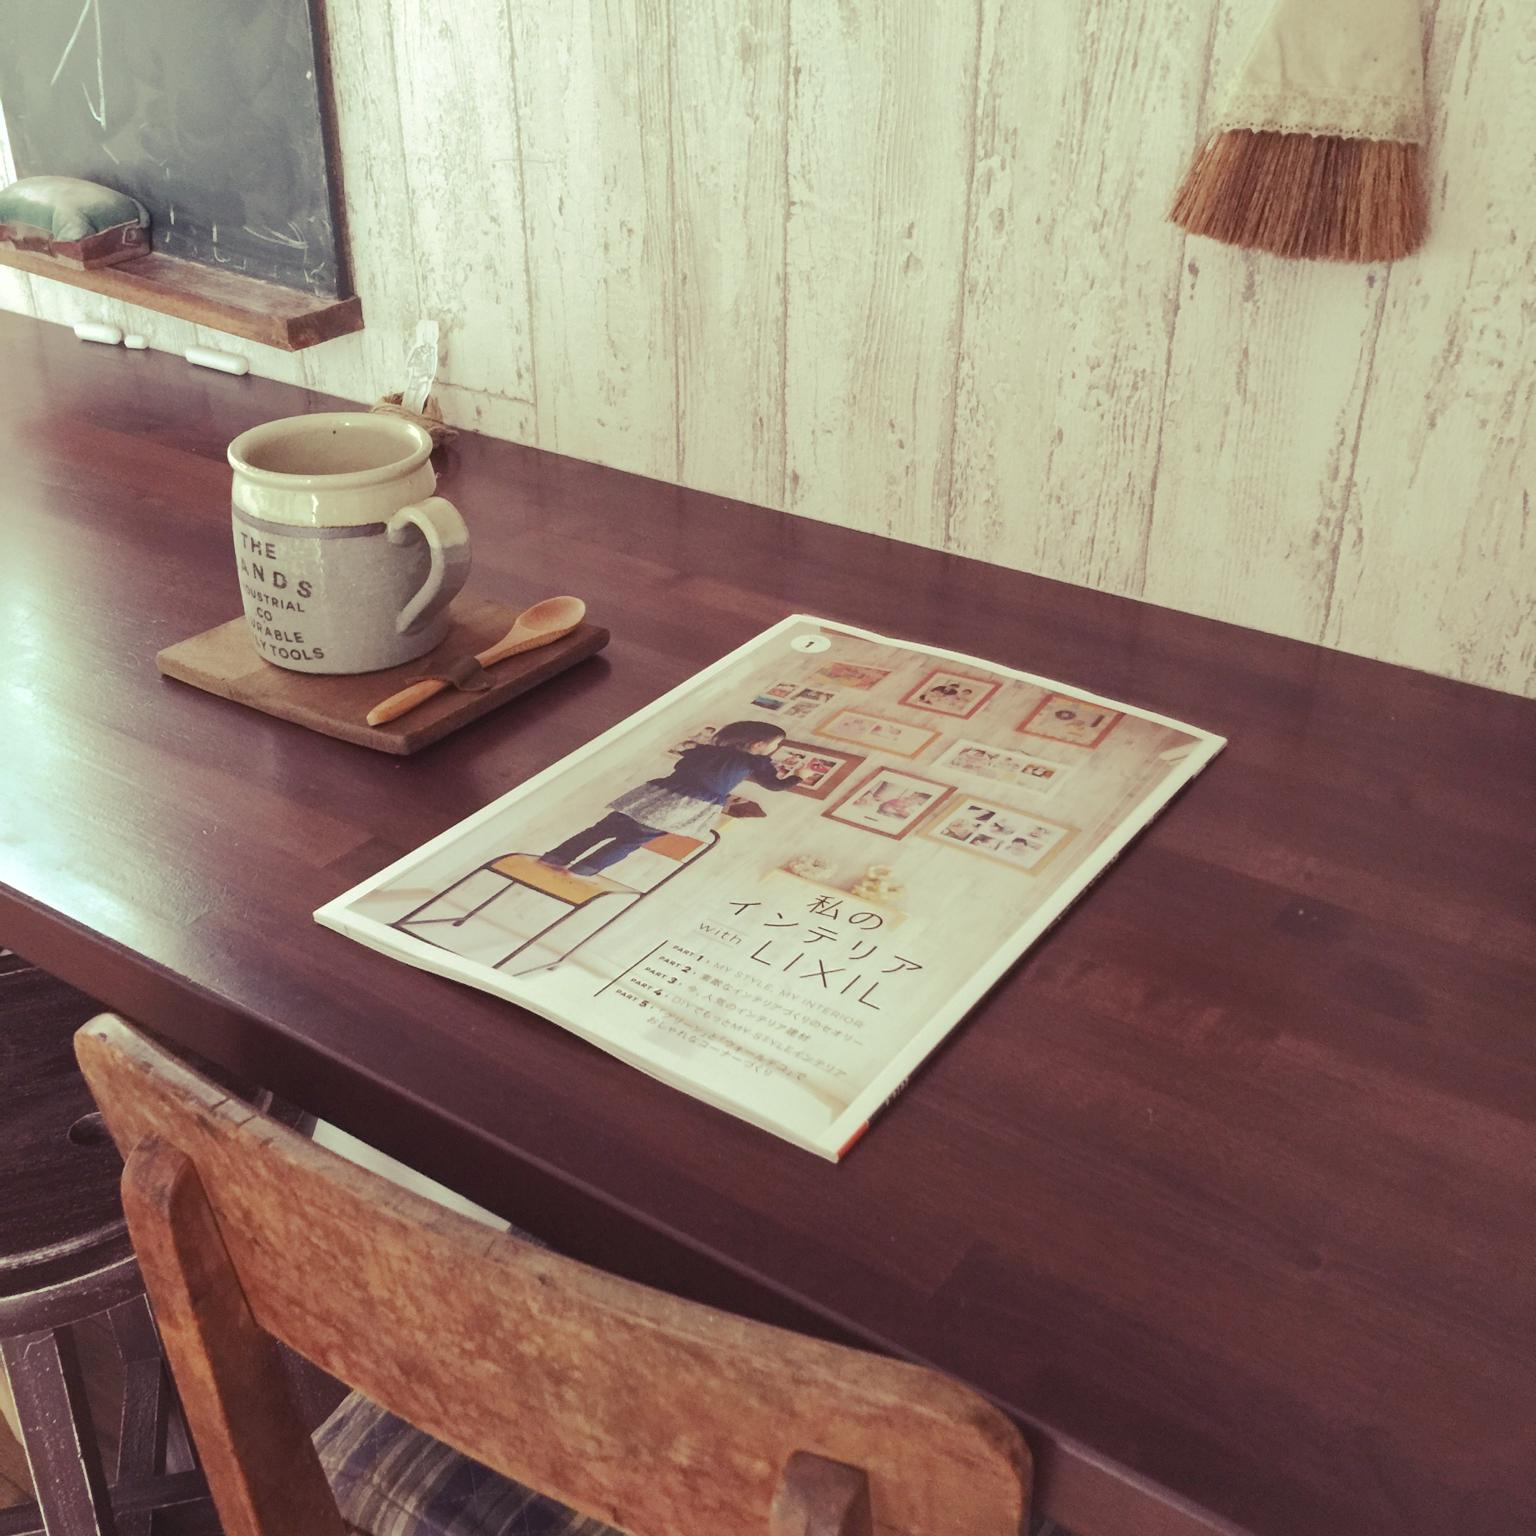 RoomClipユーザーさんの素敵なお家がLIXILの雑誌風カタログに!【PR】